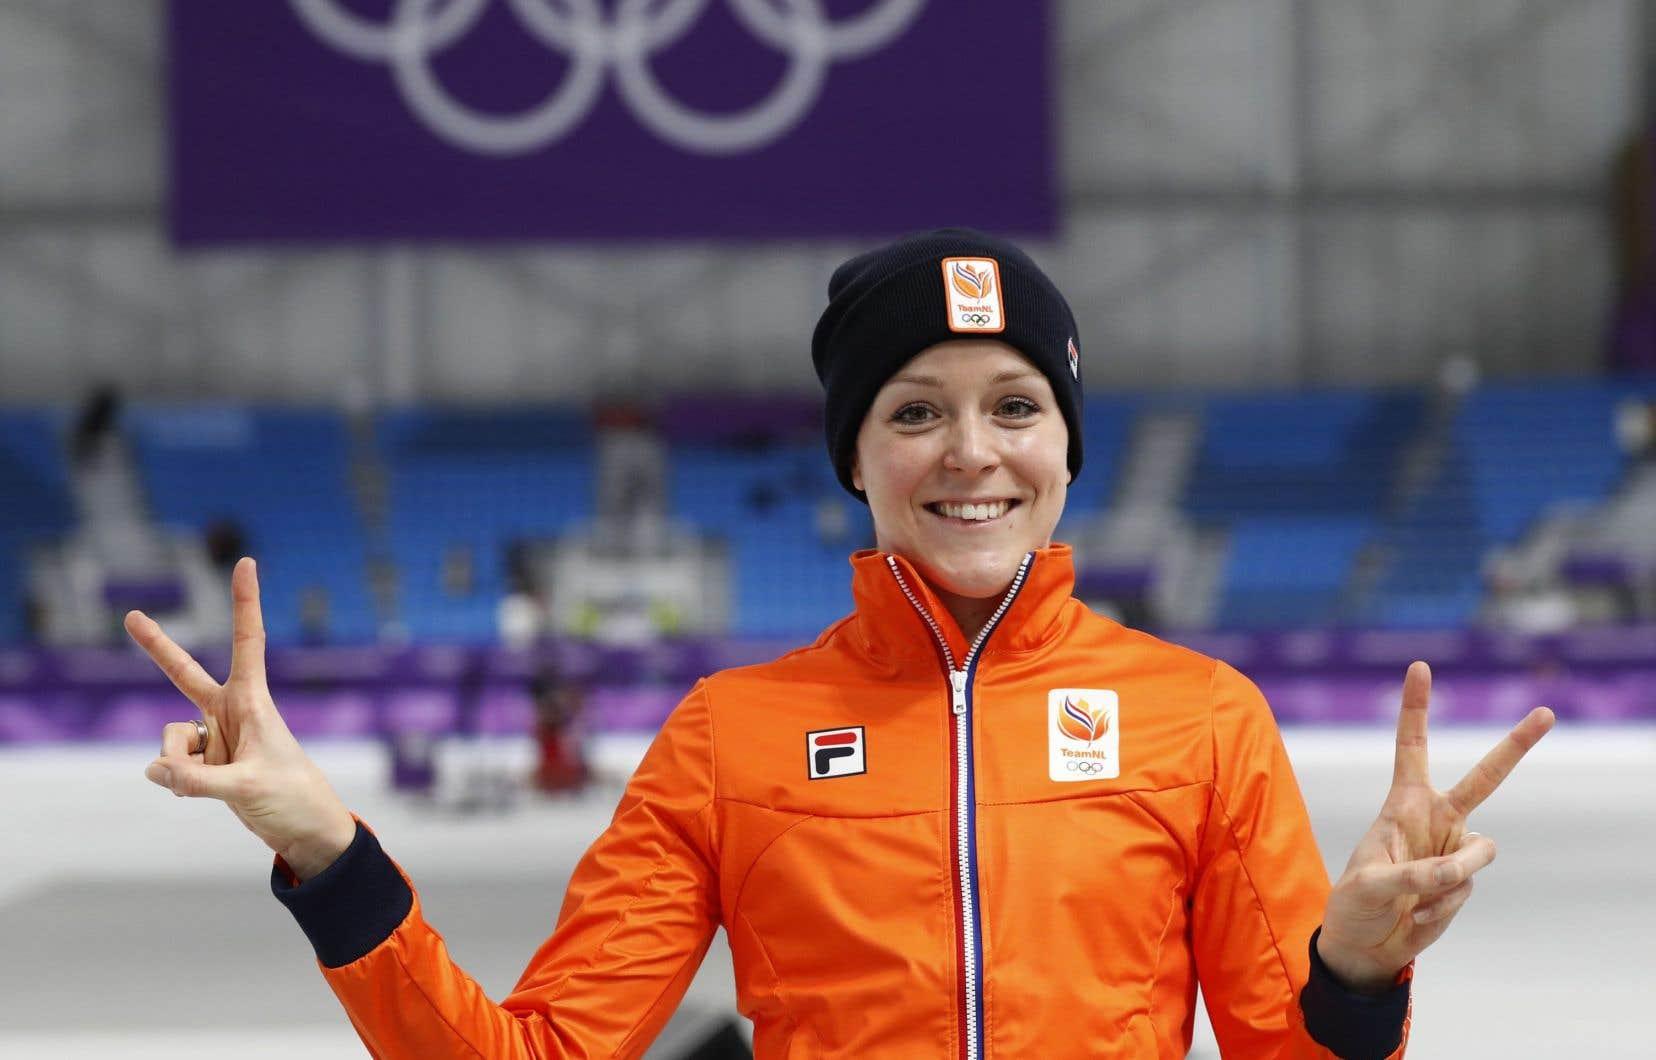 Jorien ter Mors a réussi un record olympique lors de l'épreuve du 1000 mètres.